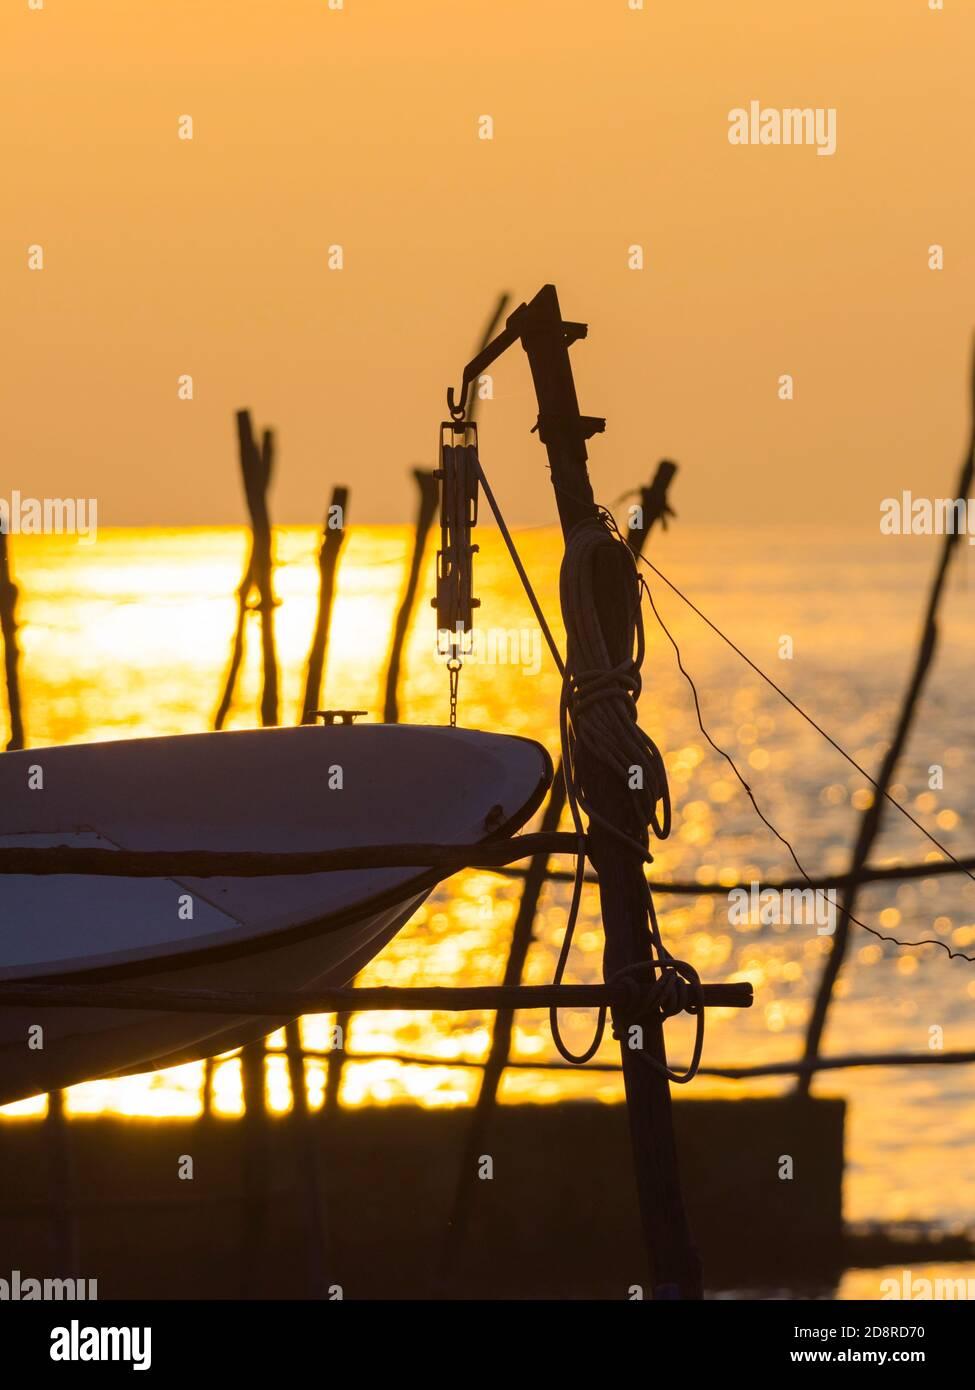 Intensive vivid sunset setting sun Yellow featuring hanging silhouette boat om wooden posts Basanija near Savudrija, Istria Coast in Croatia Europe Stock Photo